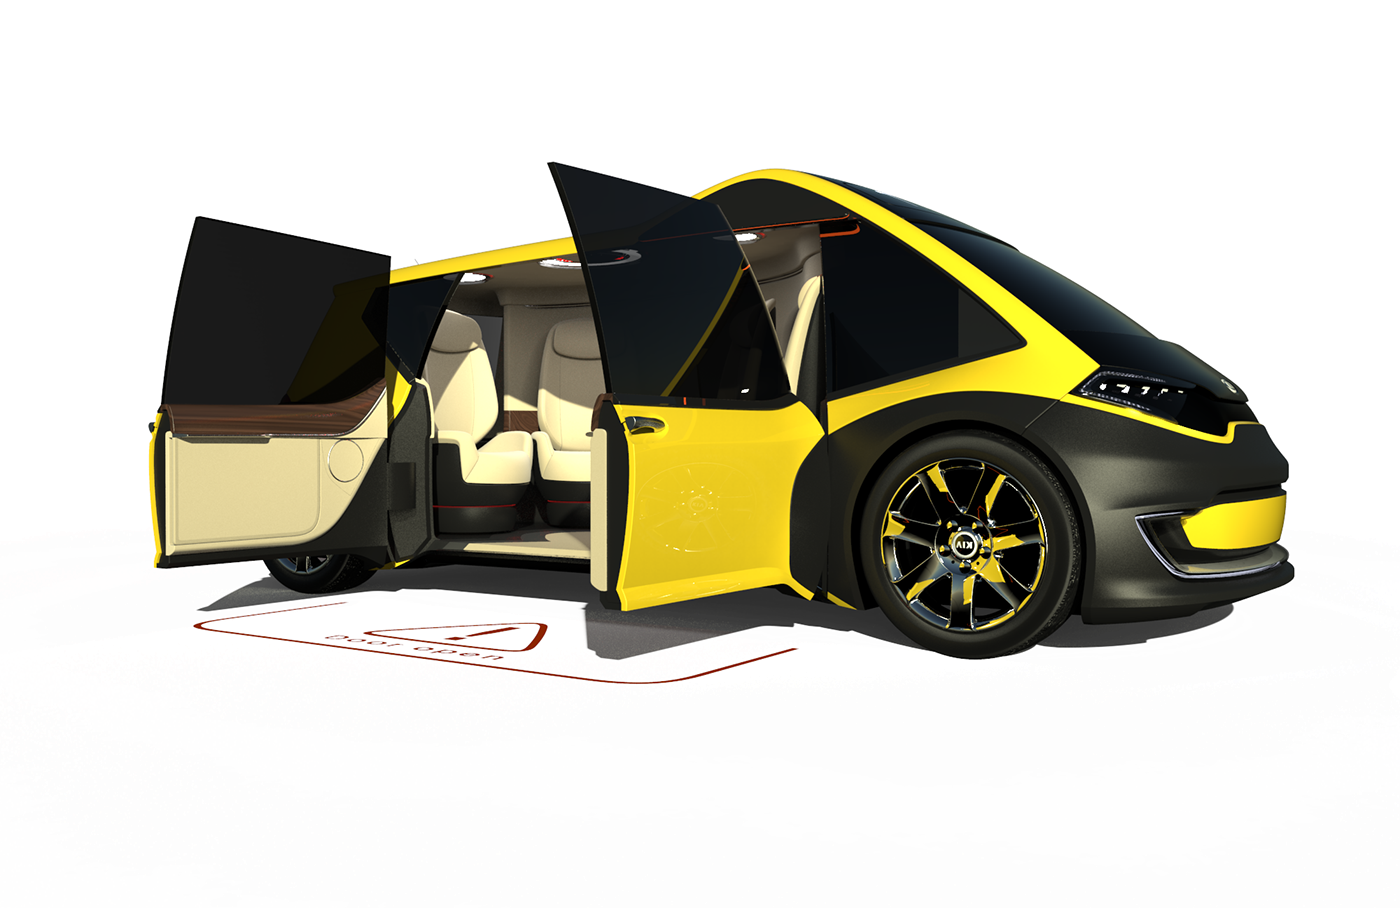 kia taxi Alias ketshot 3D 3dmodeling